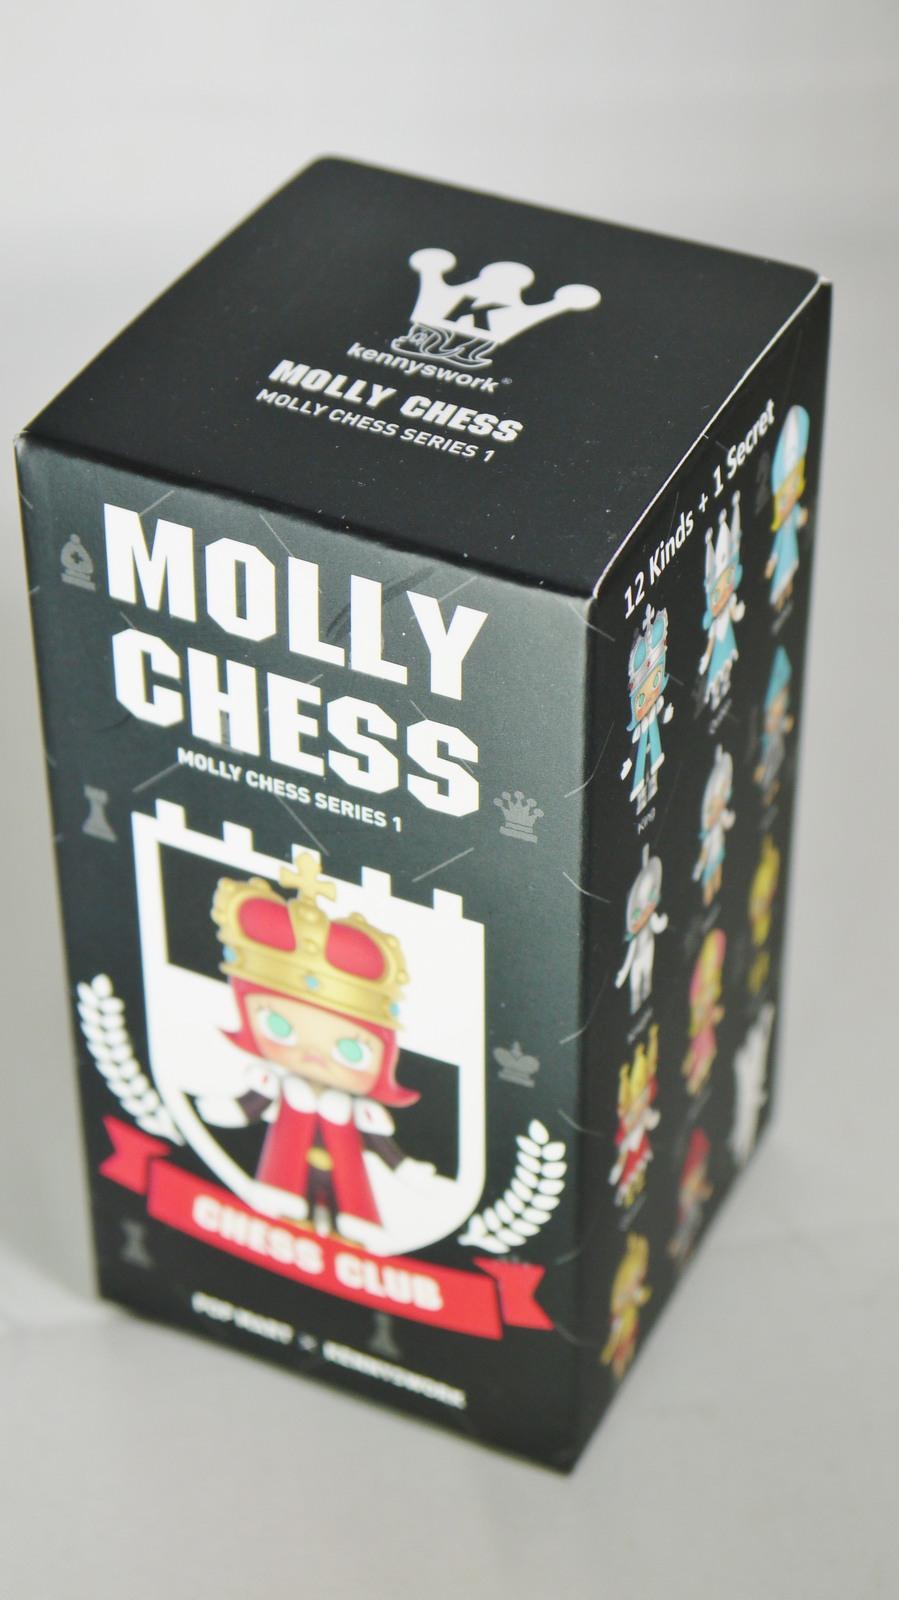 POP MART Kennyswork BLOCK Little Molly Chess Club Chessmate QUEEN Red